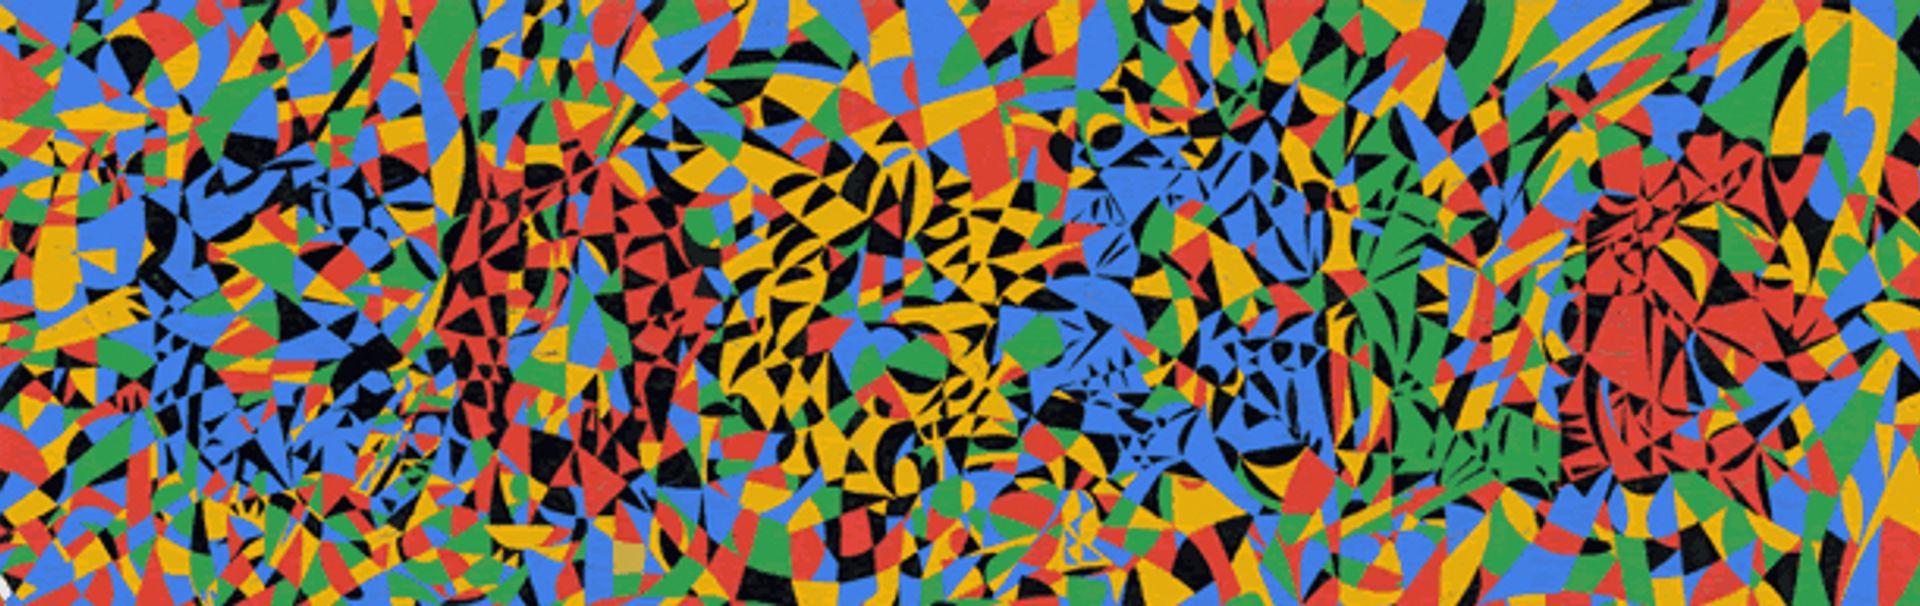 Fahrelnissa Zeid's kaleidoscopic design as seen on Google courtesy Google